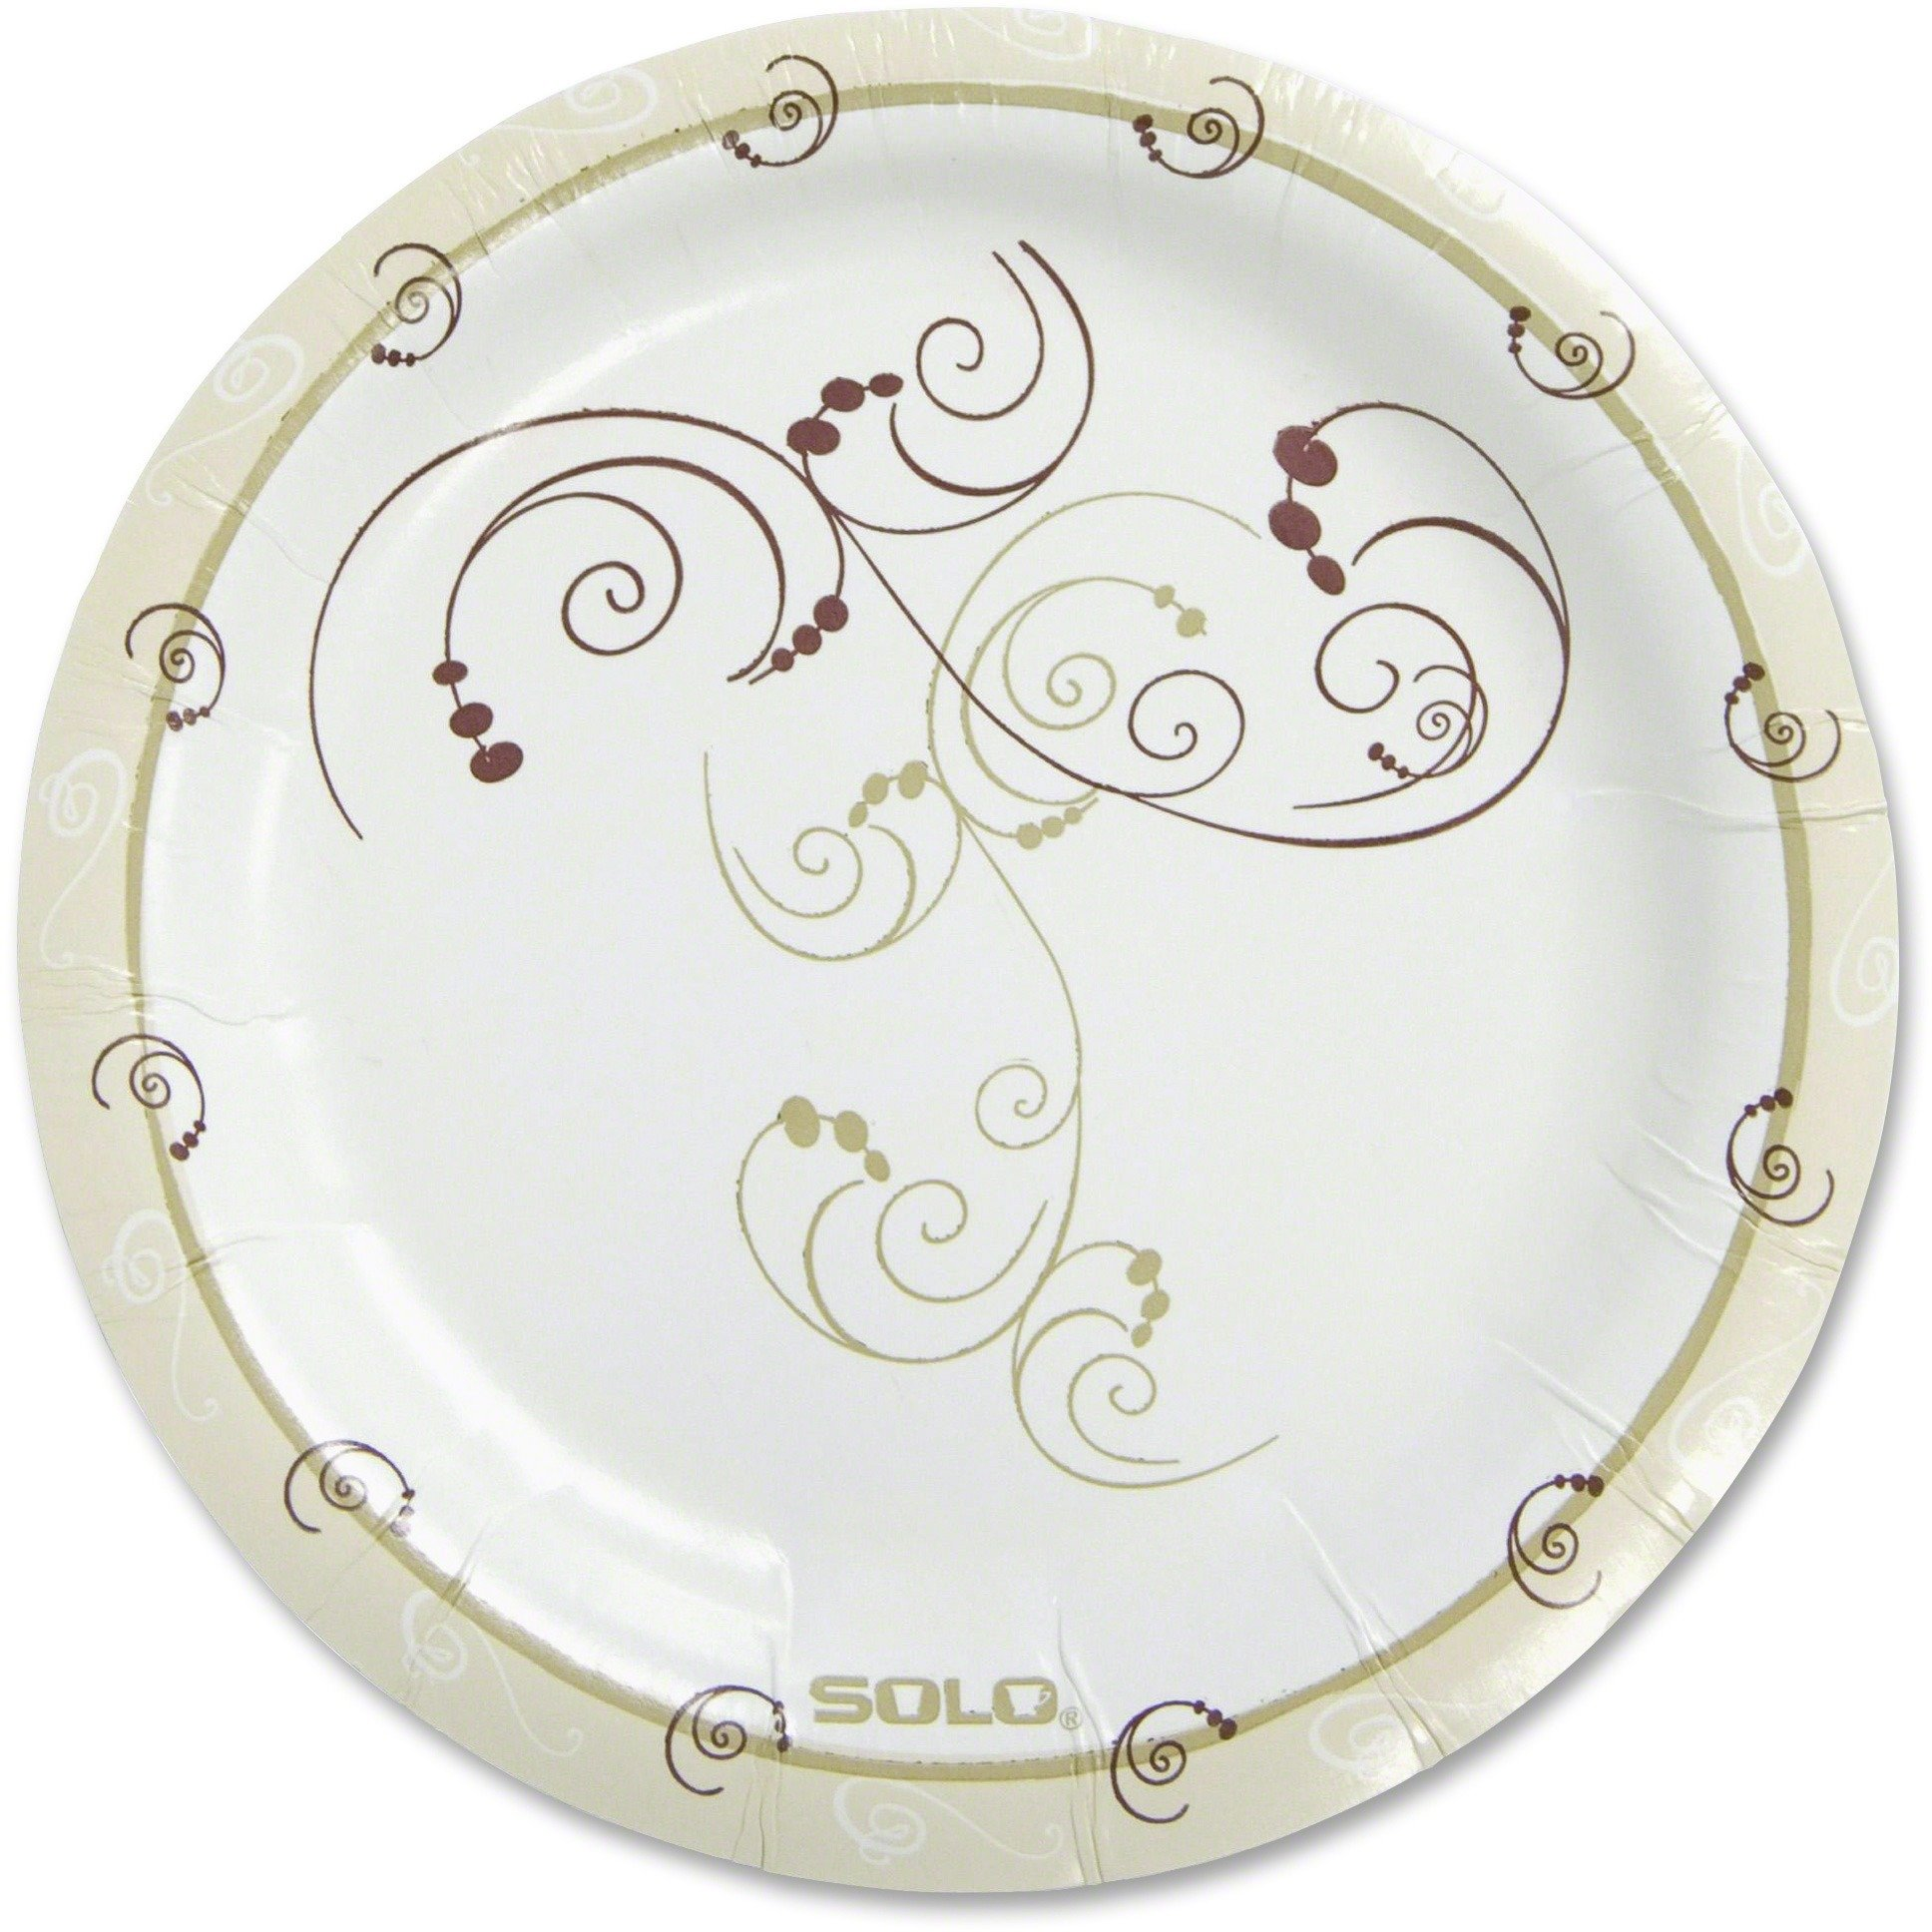 SOLO CUPS MP9J8001PK Symphony Paper Dinnerware, Mediumweight Plate, 8 1/2'' Round, Tan, 125/Pack